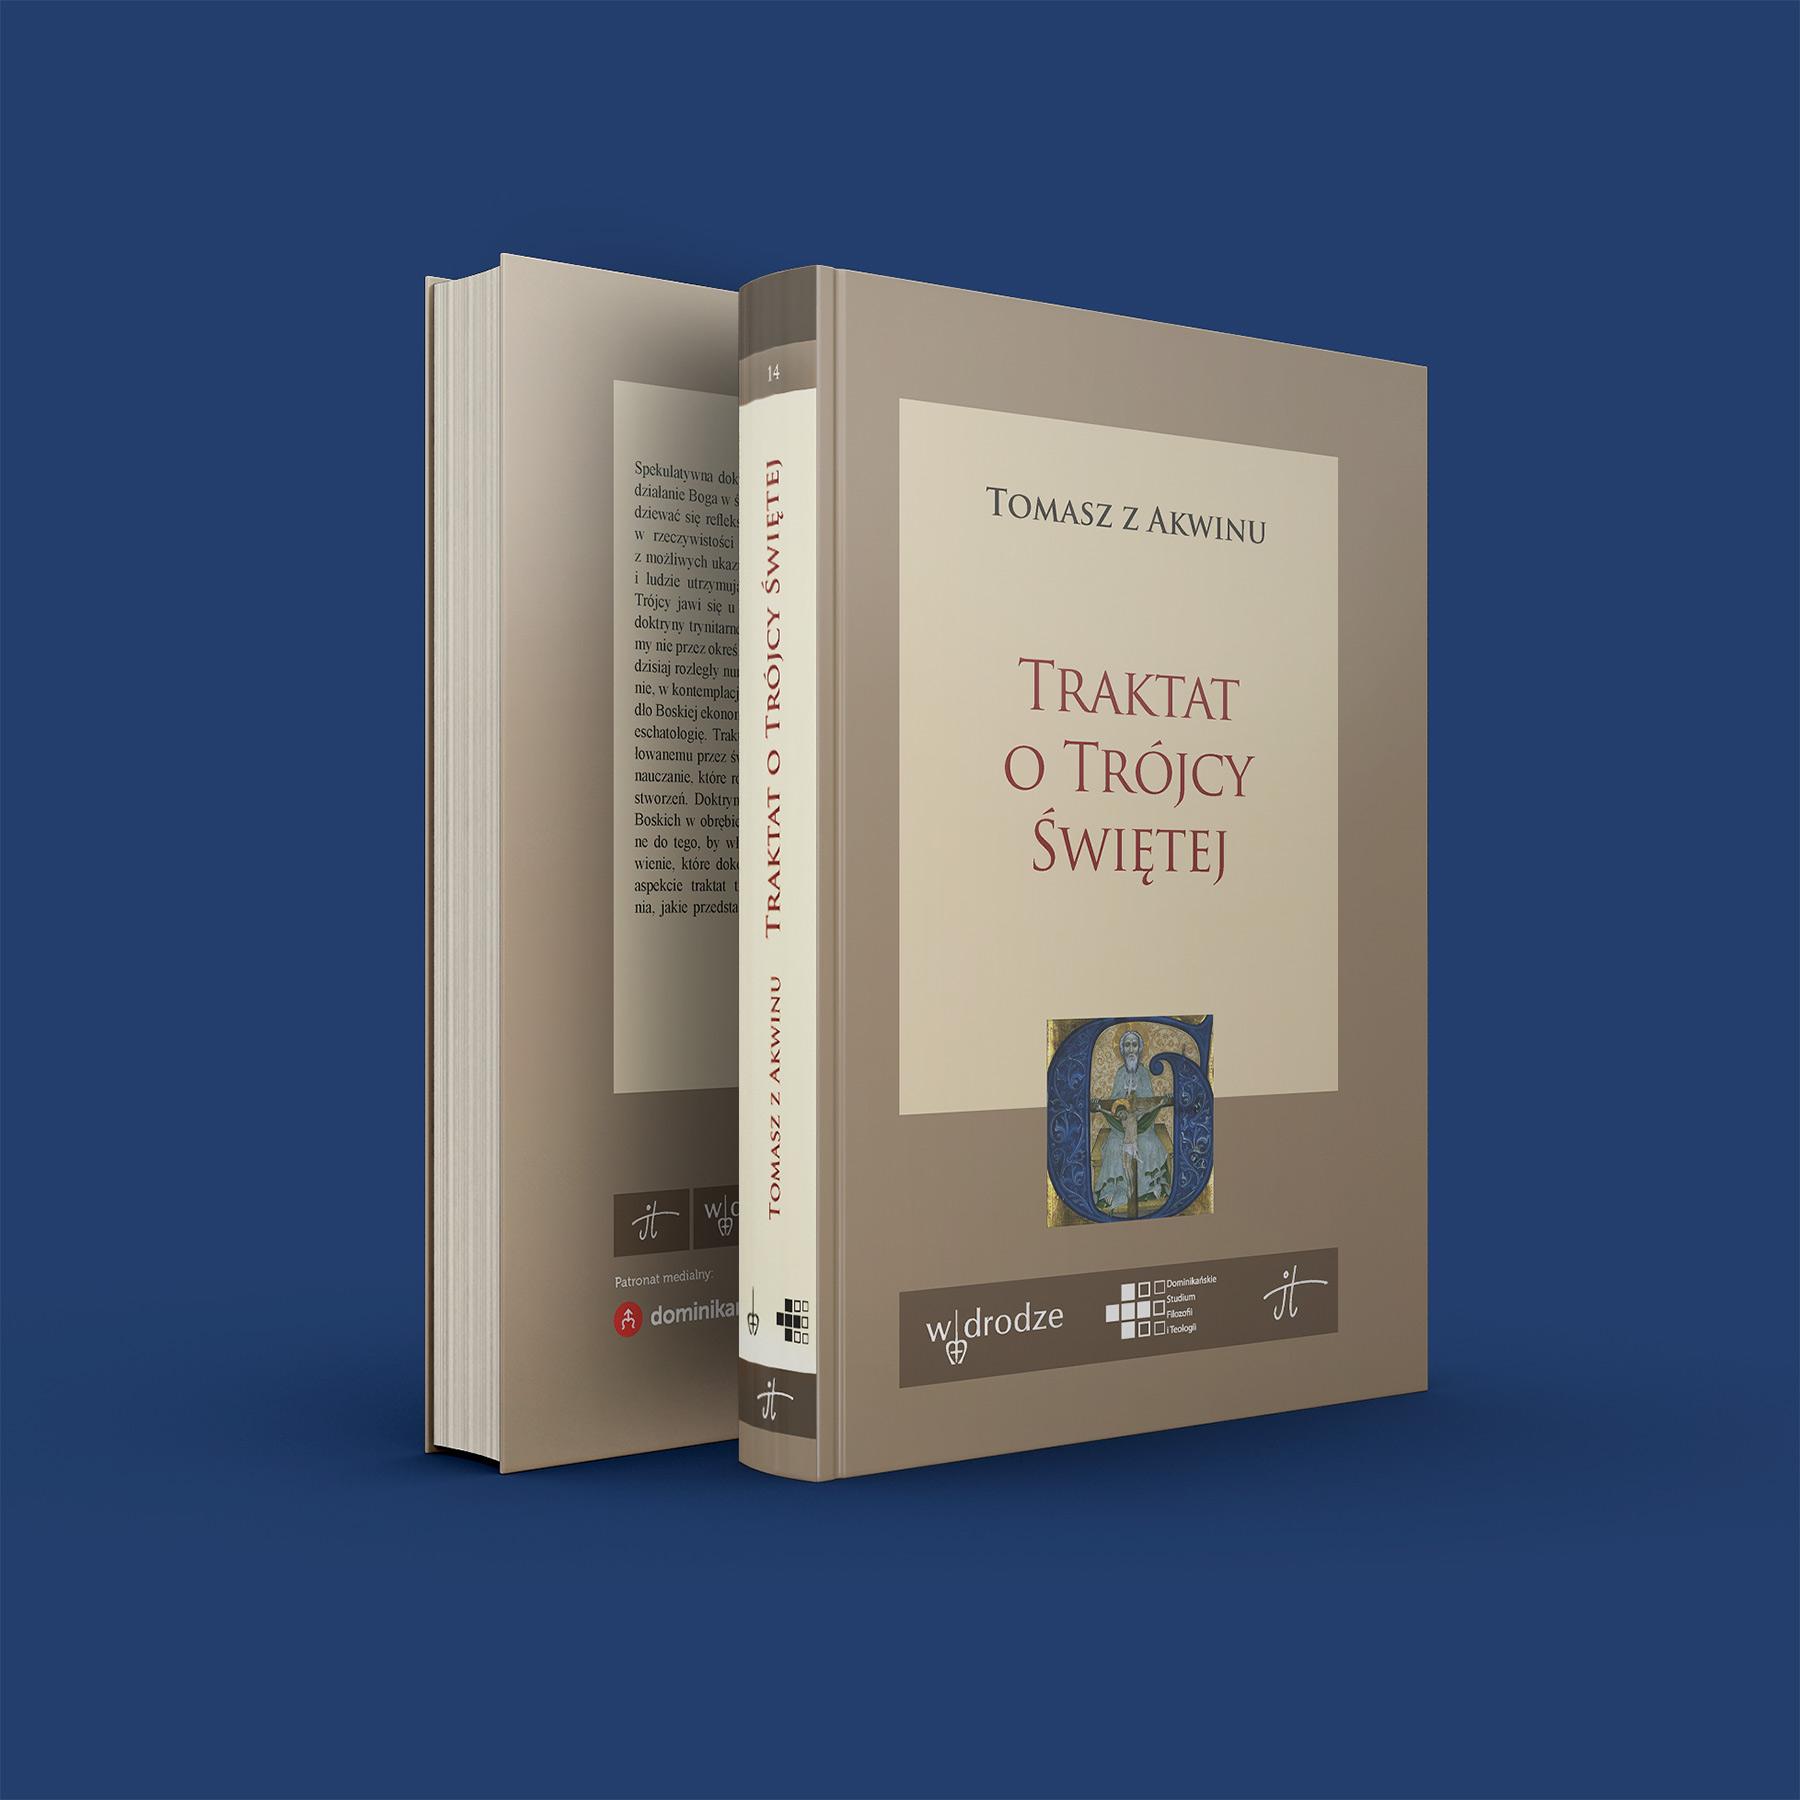 Traktat o Trójcy Świętej. Summa teologii, I, q. 27–43